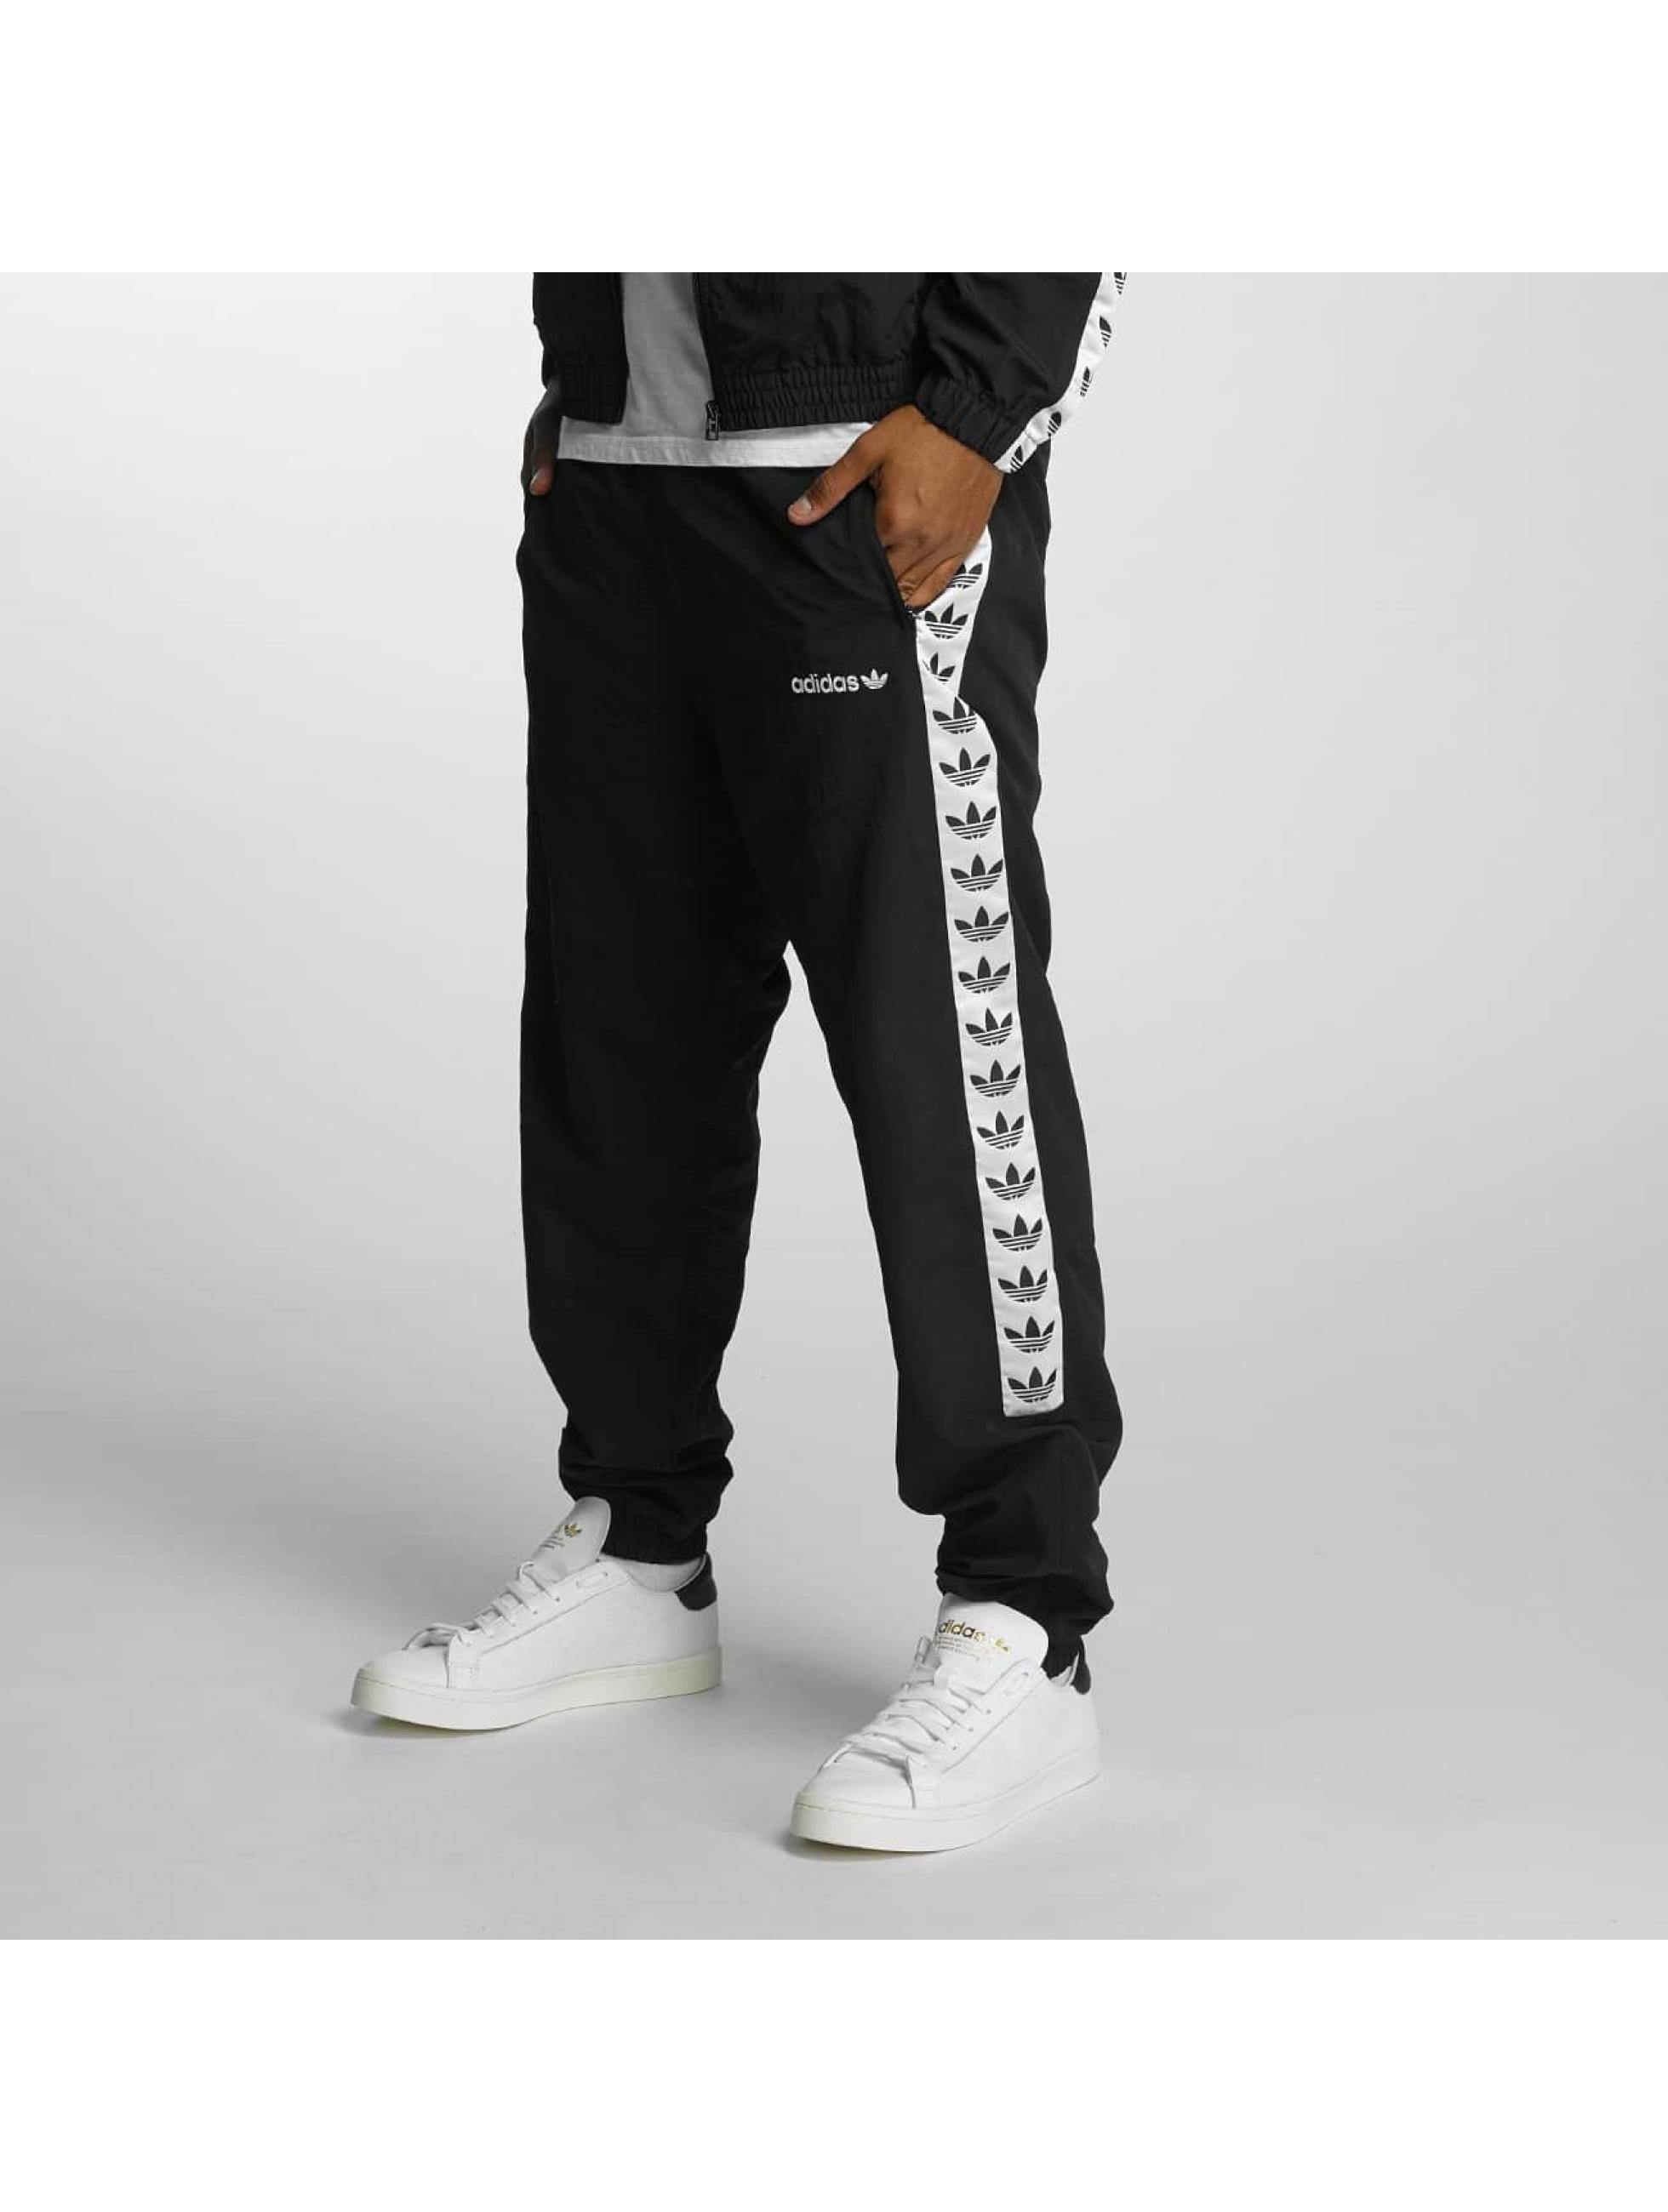 adidas herren jogginghose tnt tape wind in schwarz 368772. Black Bedroom Furniture Sets. Home Design Ideas